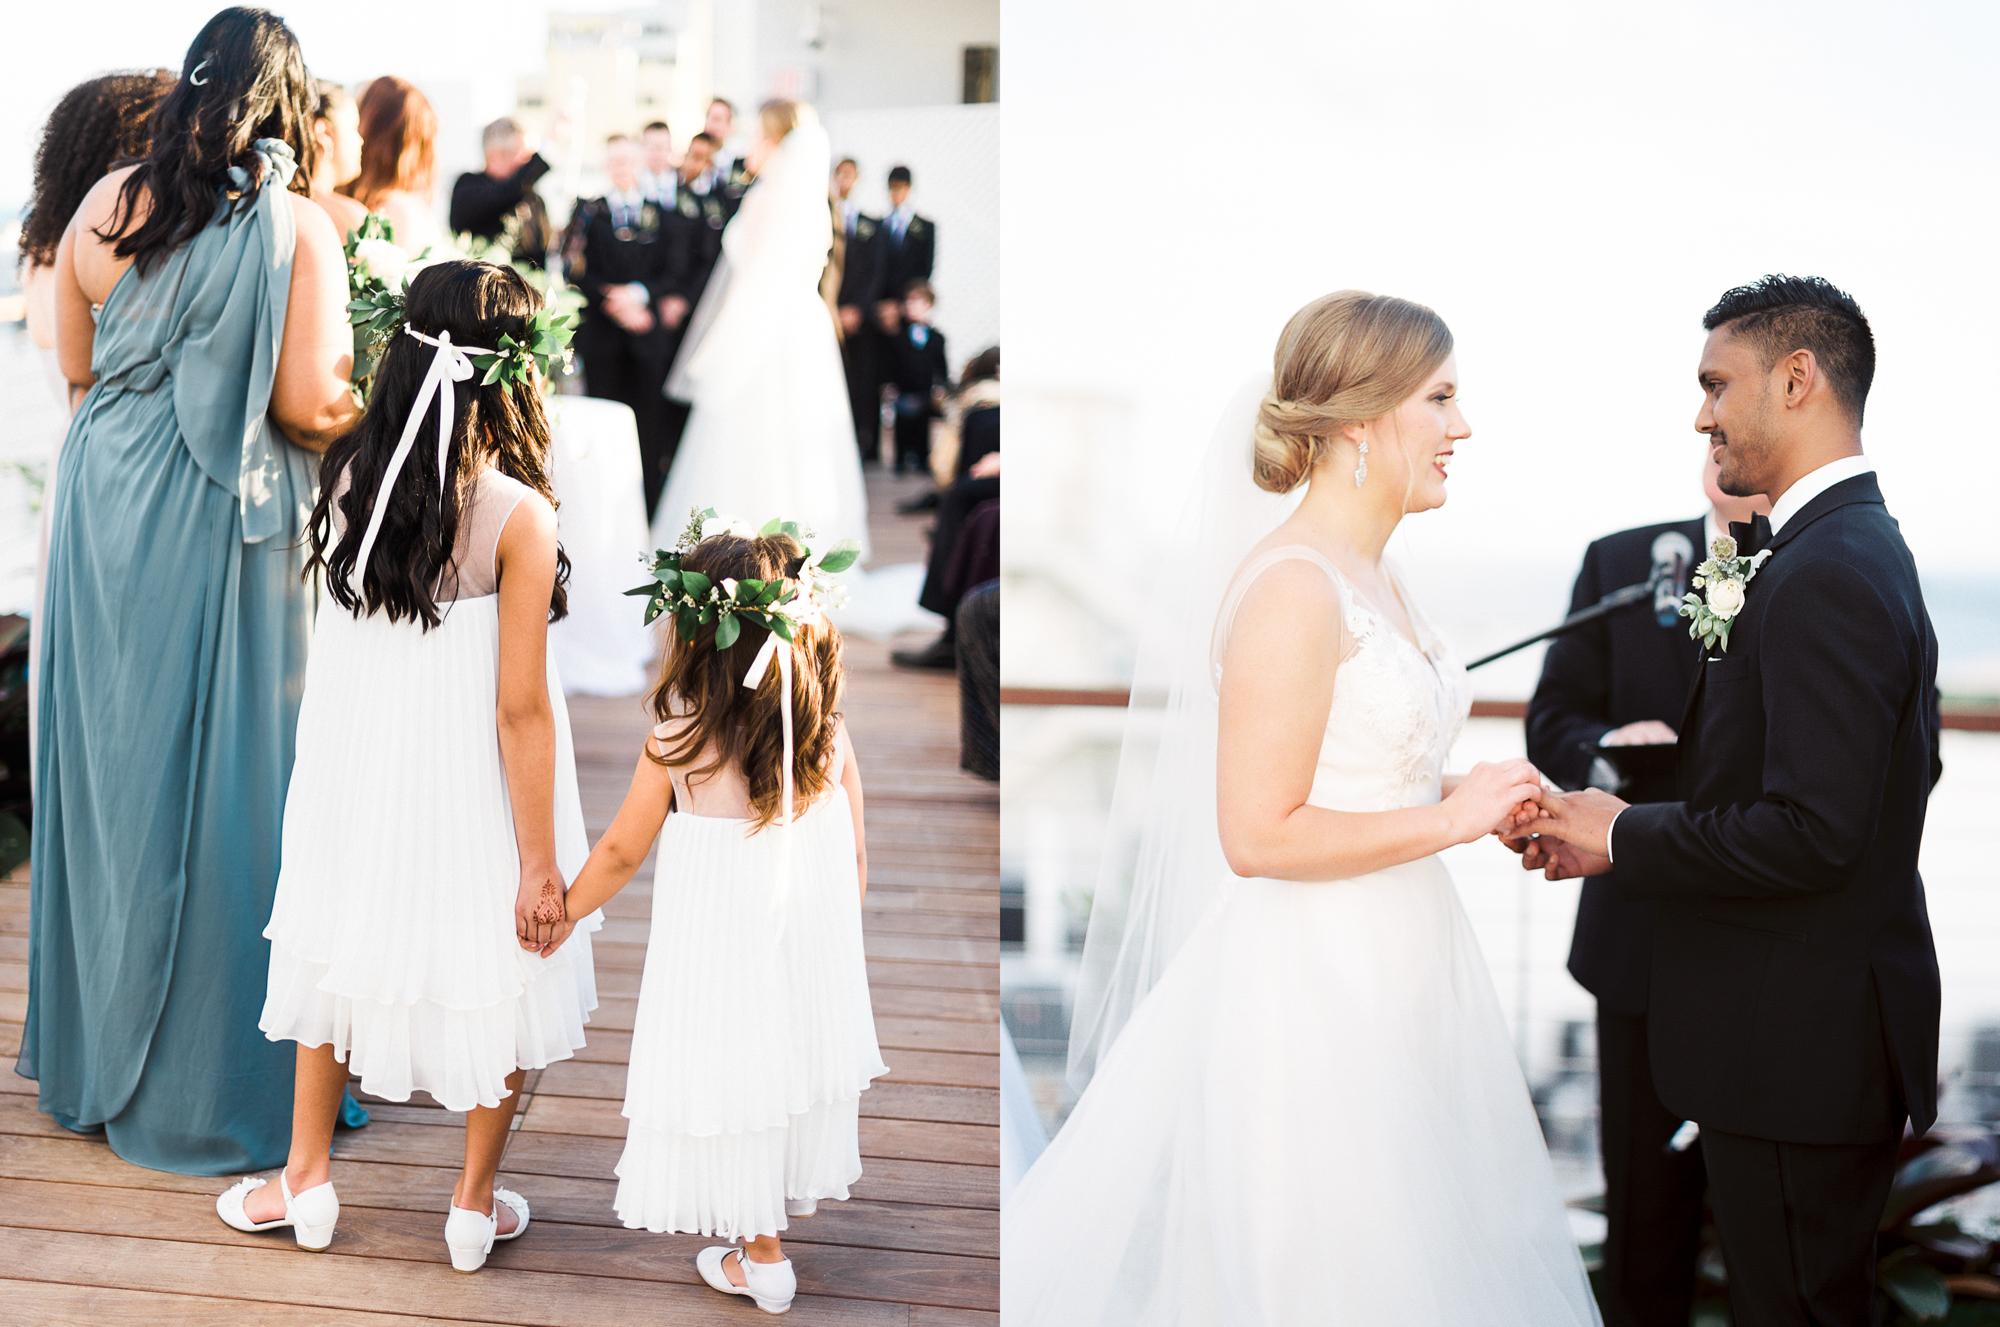 betsy-hotel-wedding-south-beach-miami-charleston-south-carolina-destination-wedding-photographer-20.jpg